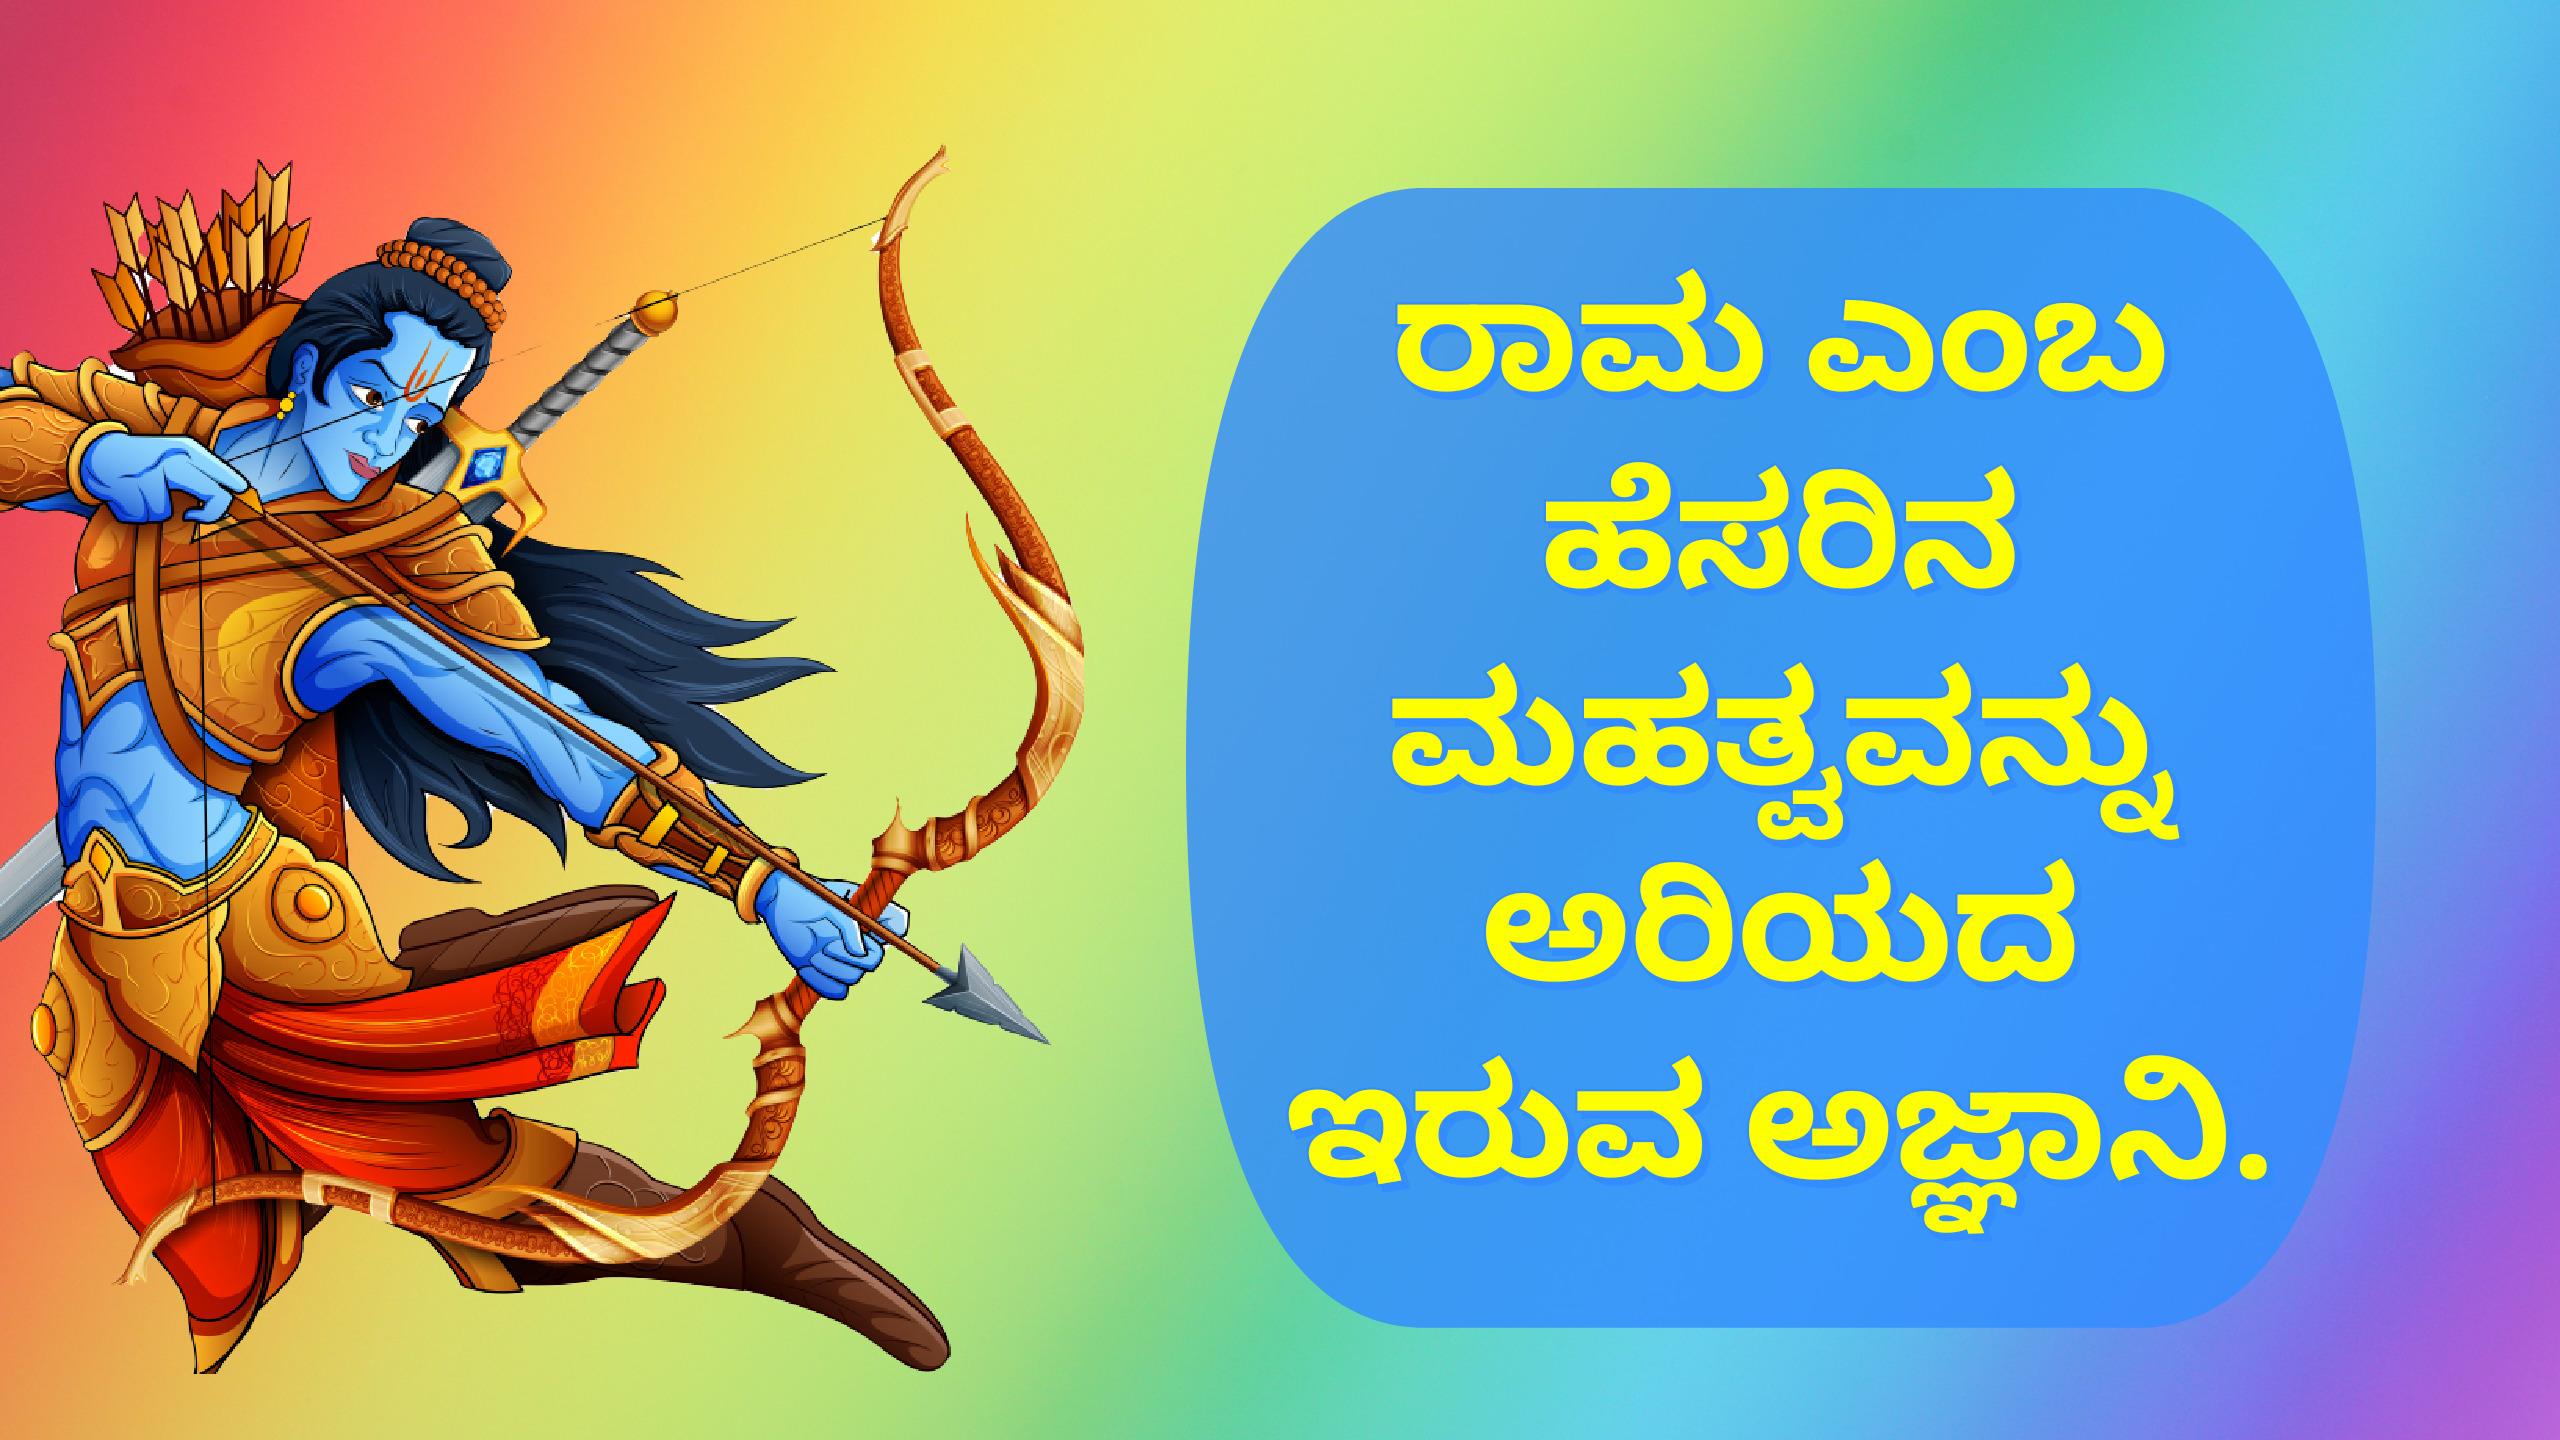 14. Shree Ram Quotes in Kannada